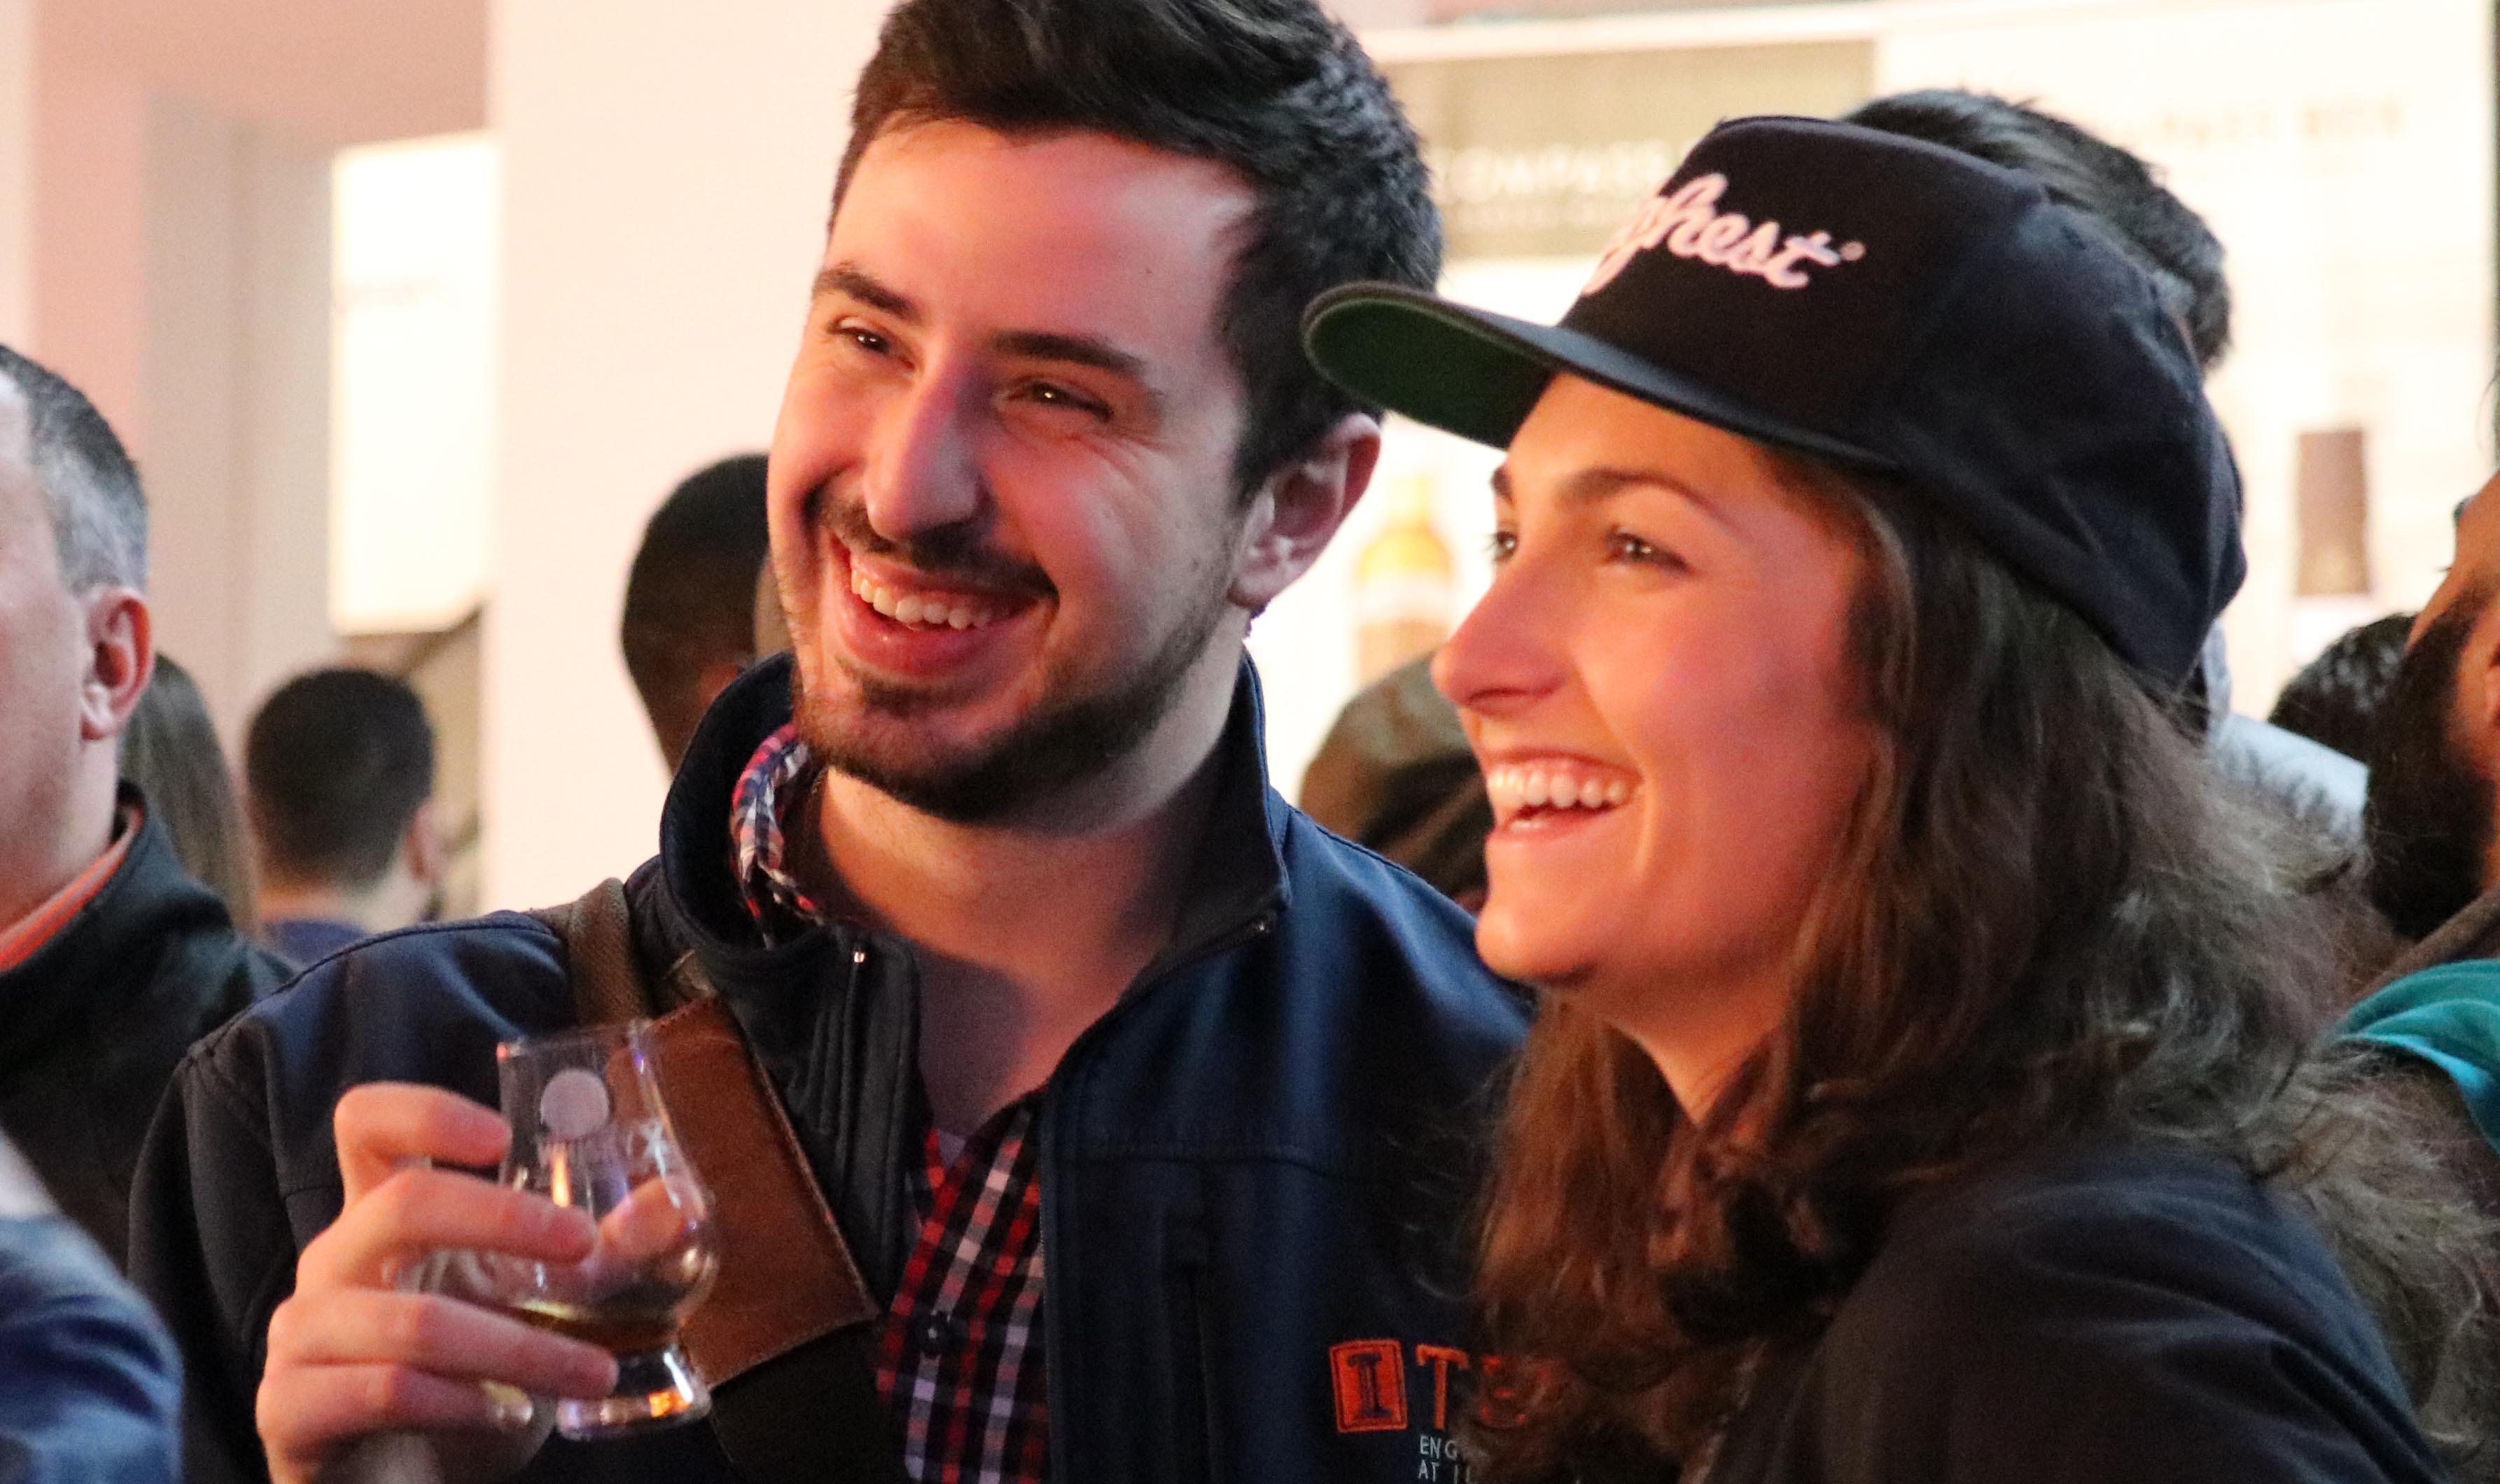 WhiskyX Happy Couple